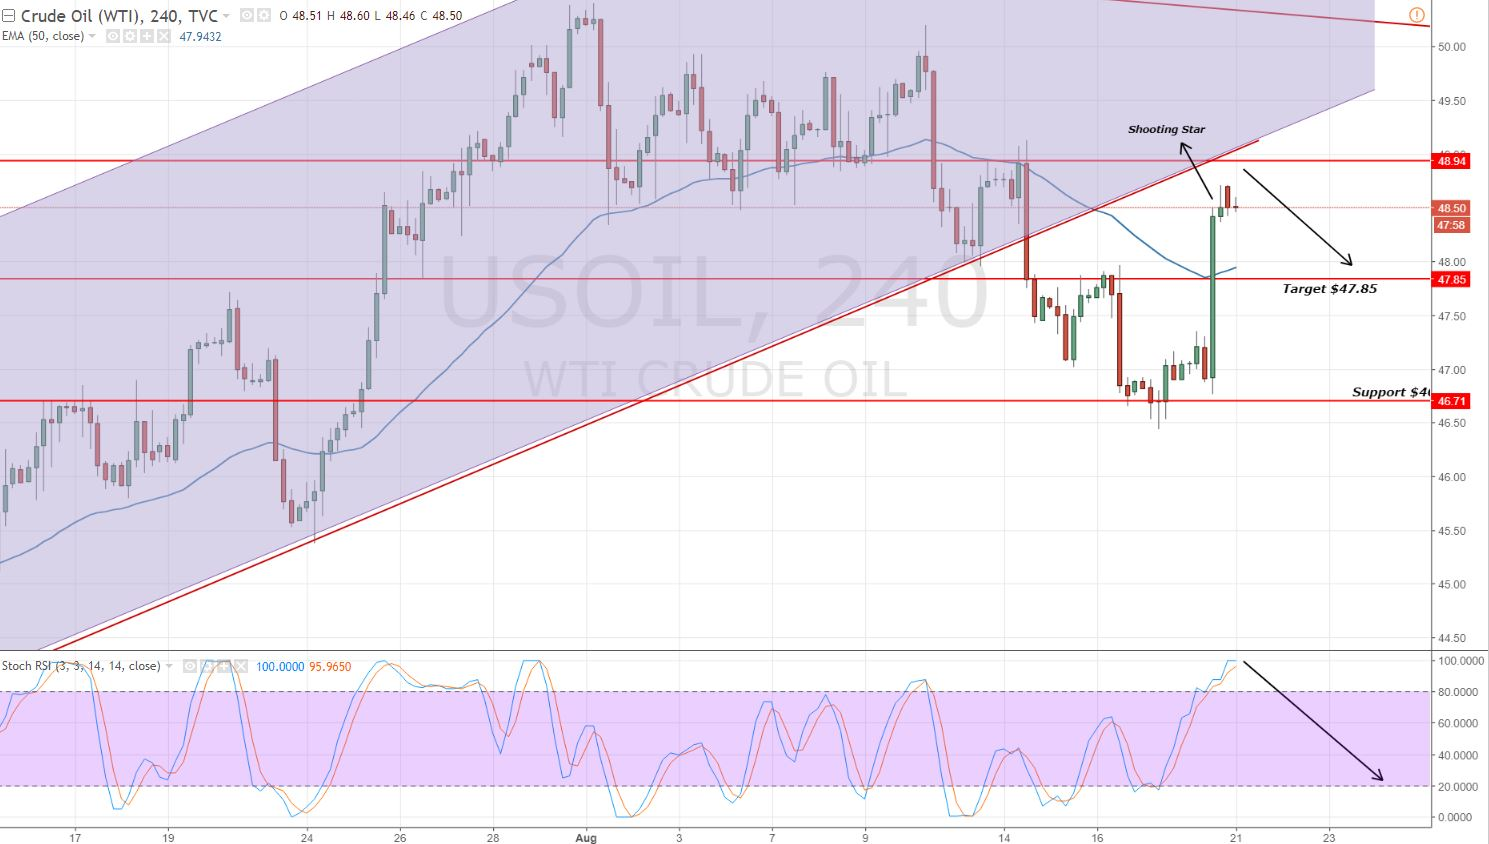 Crude Oil - 4 Hour Chart - Bearish Setup